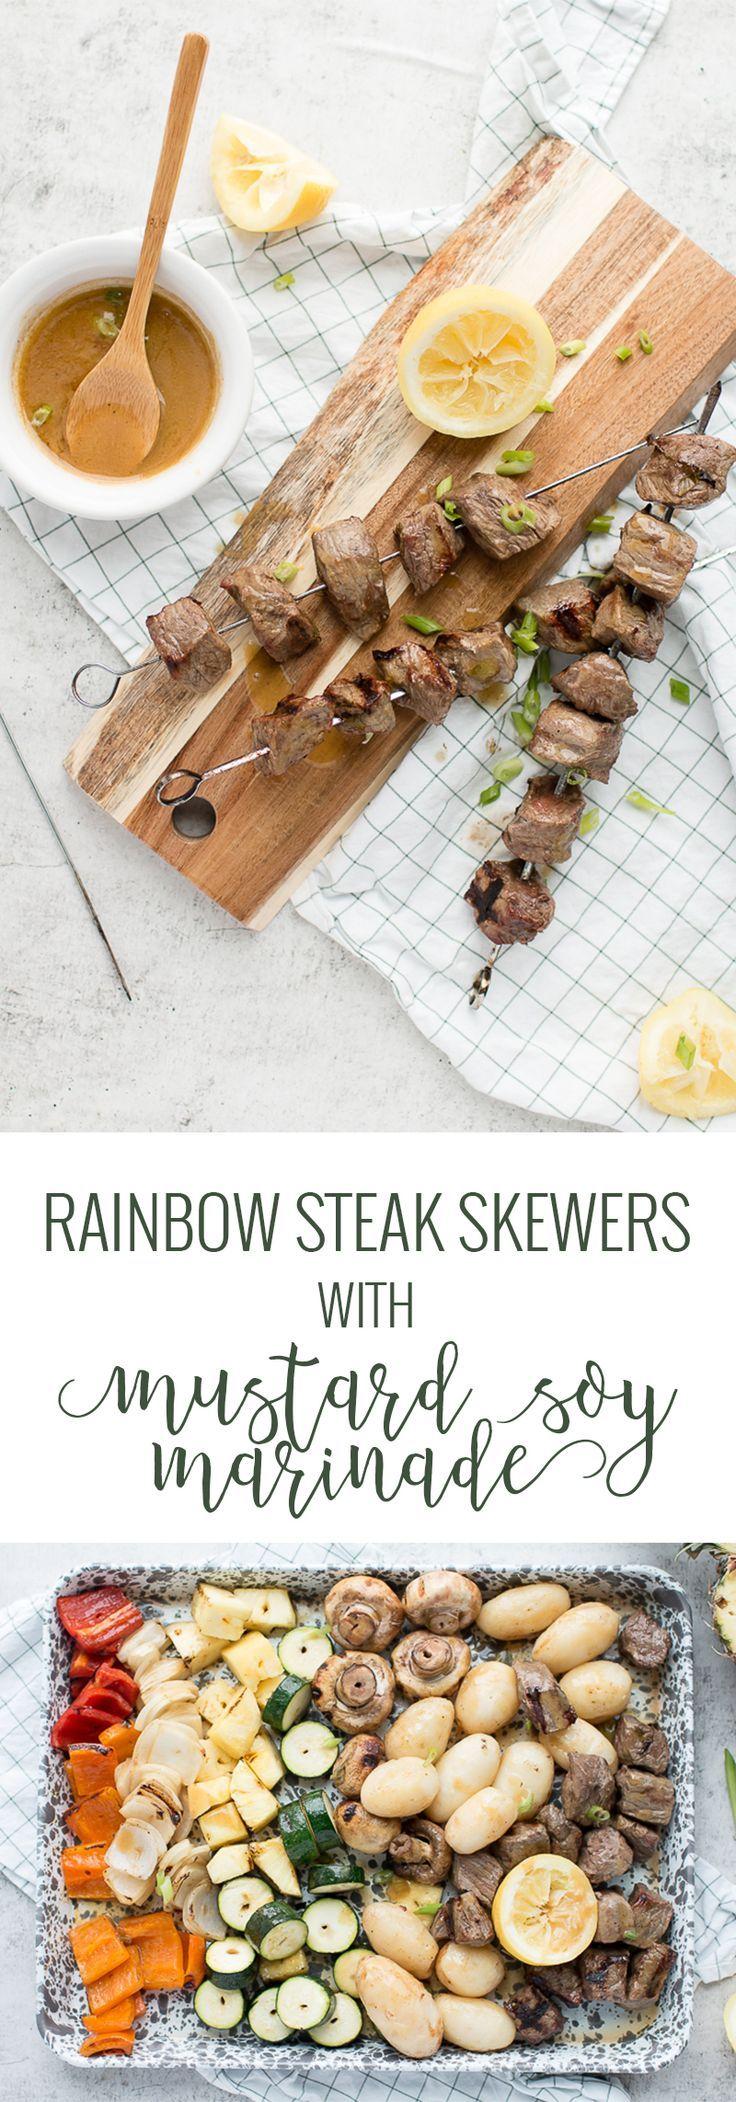 The 25+ best Steak skewers ideas on Pinterest | Kabobs ...